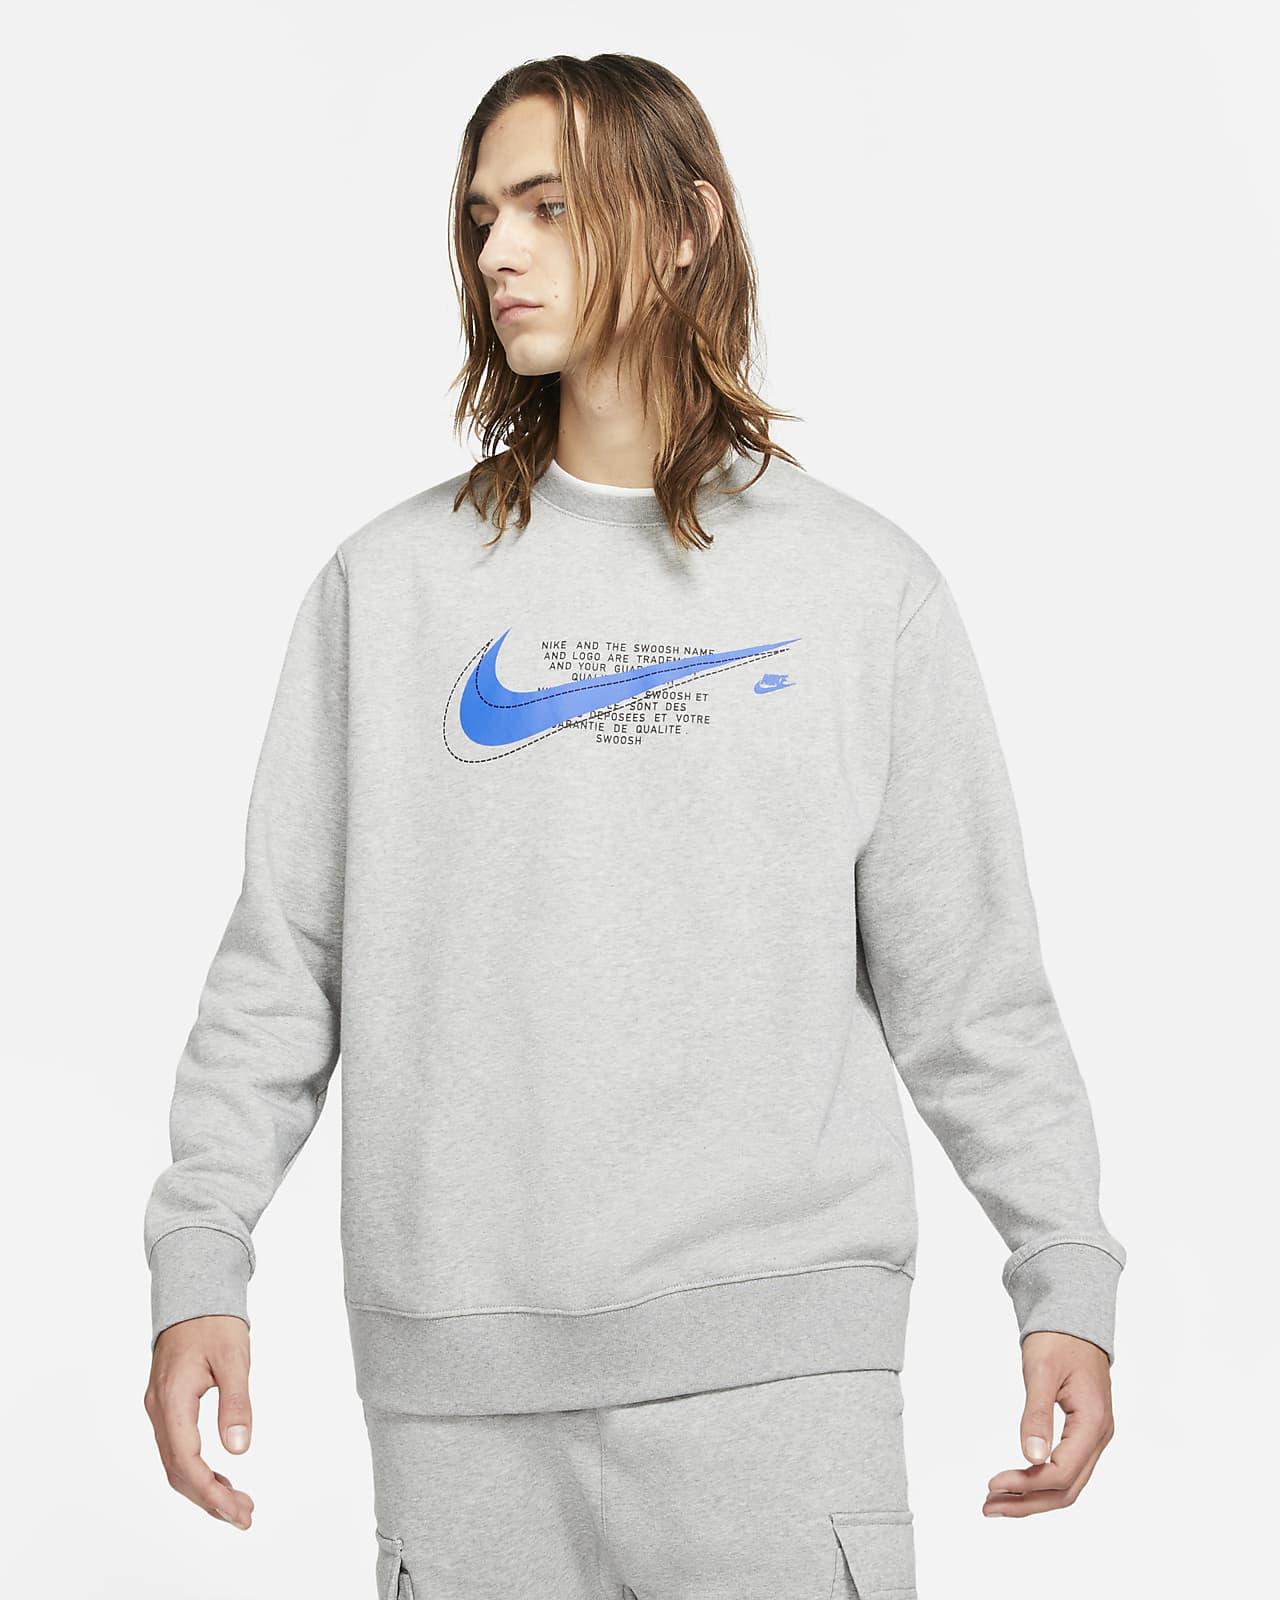 Fleecetröja Nike Sportswear Court för män